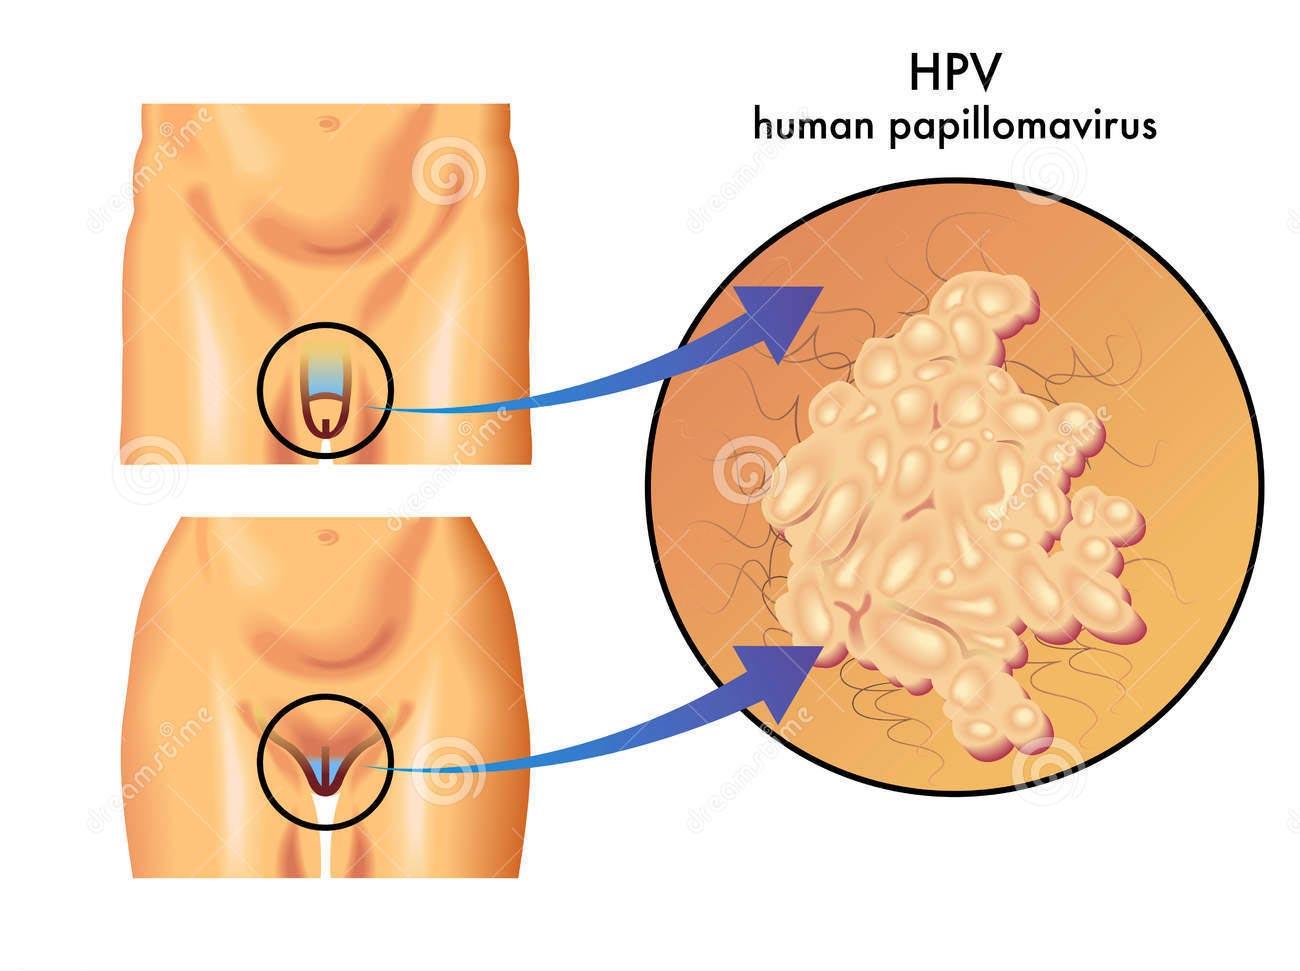 papilloma virus donne trasmissione sessuale)